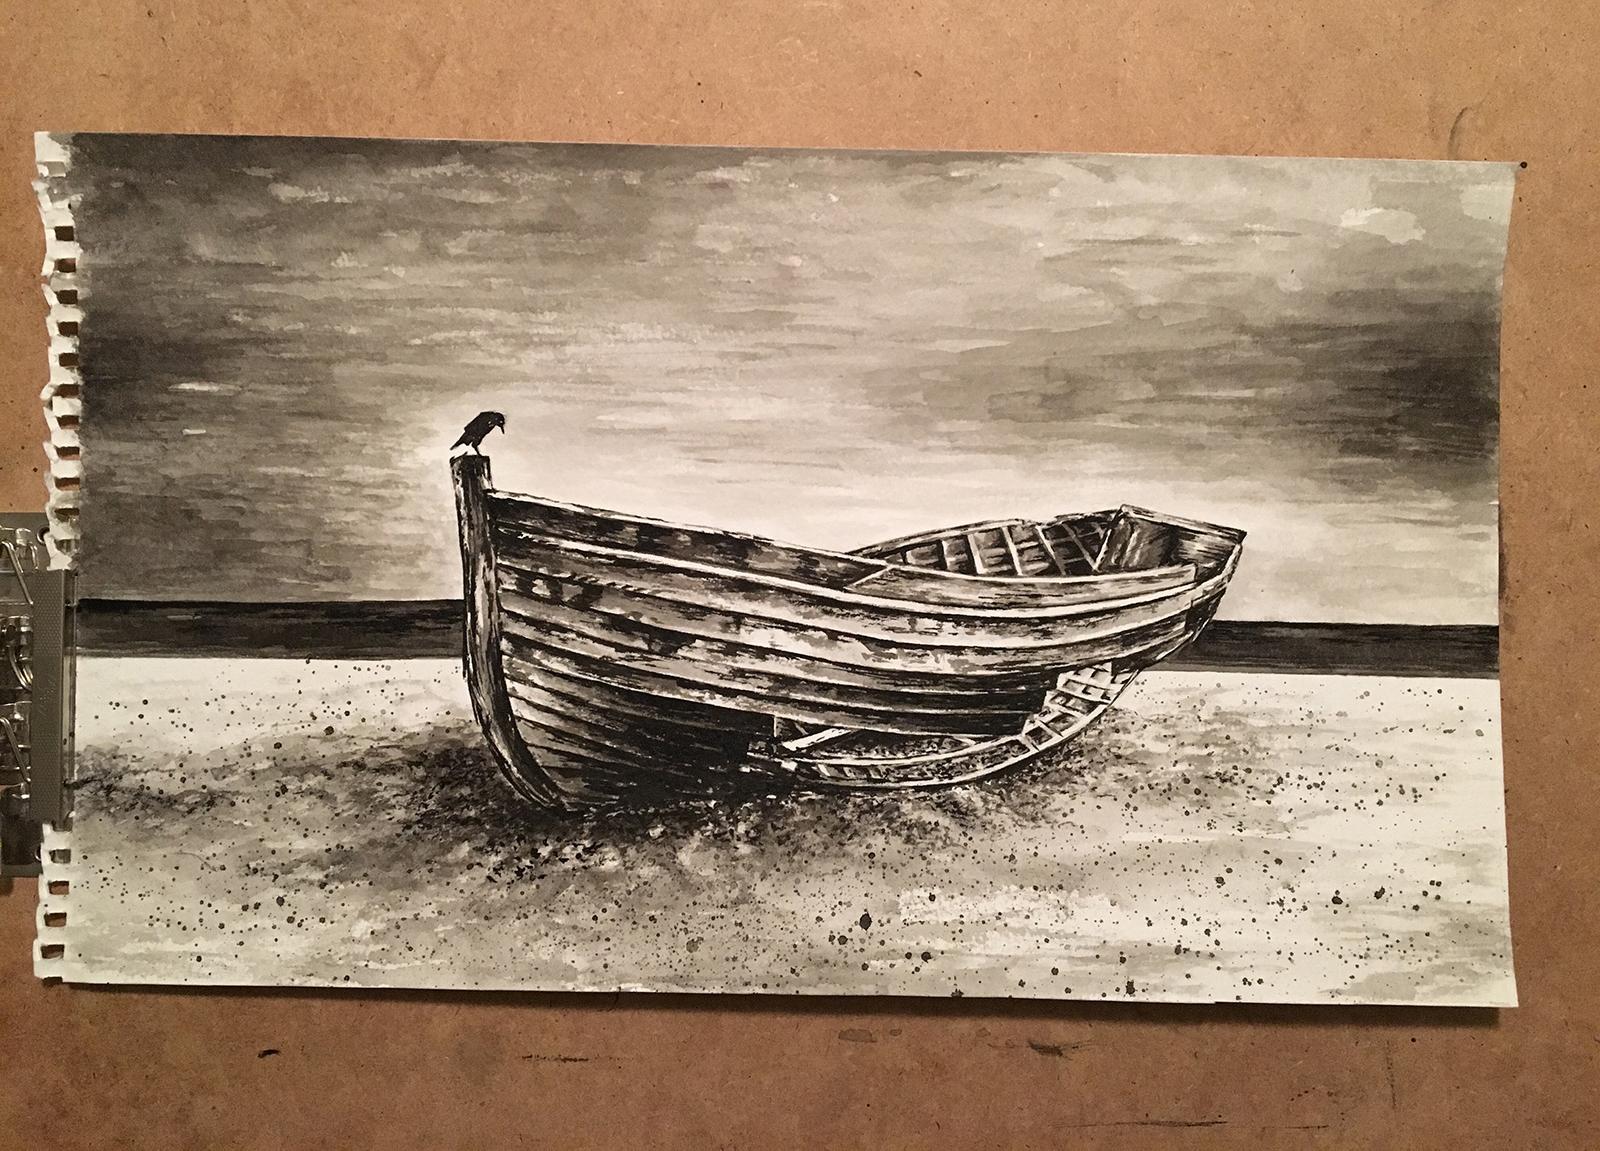 jordan-fretz-design-boat-ink-wash-painting-smaller-3.jpg